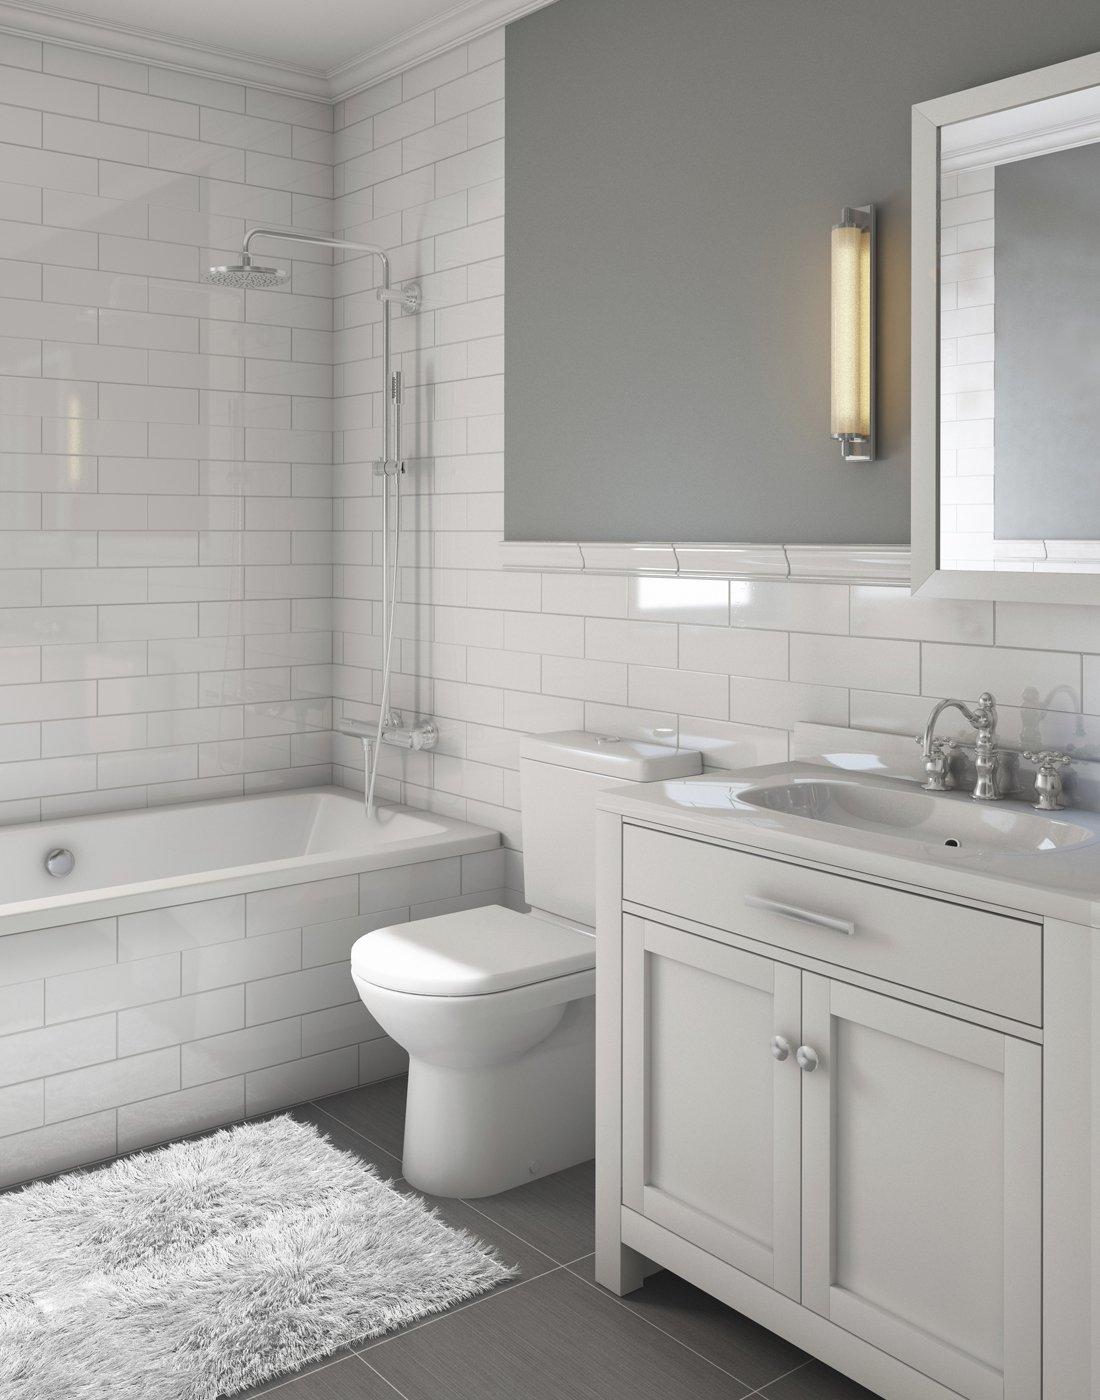 Newely remodeled bathroom